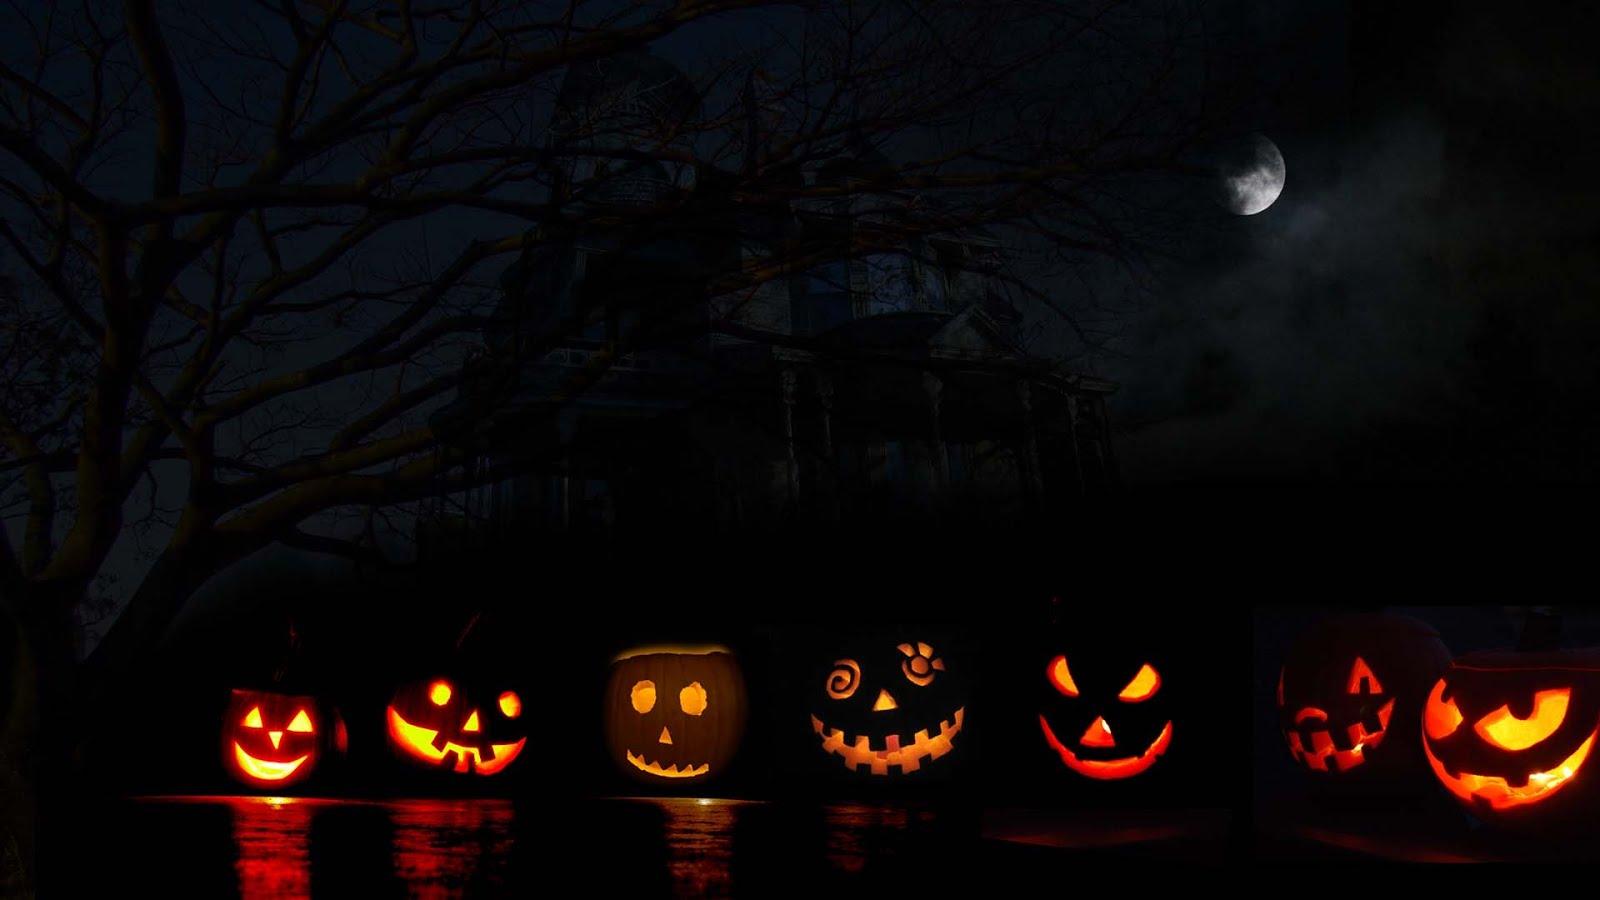 HD}} Halloween Wallpaper, Cute Halloween Wallpapers,Free Halloween